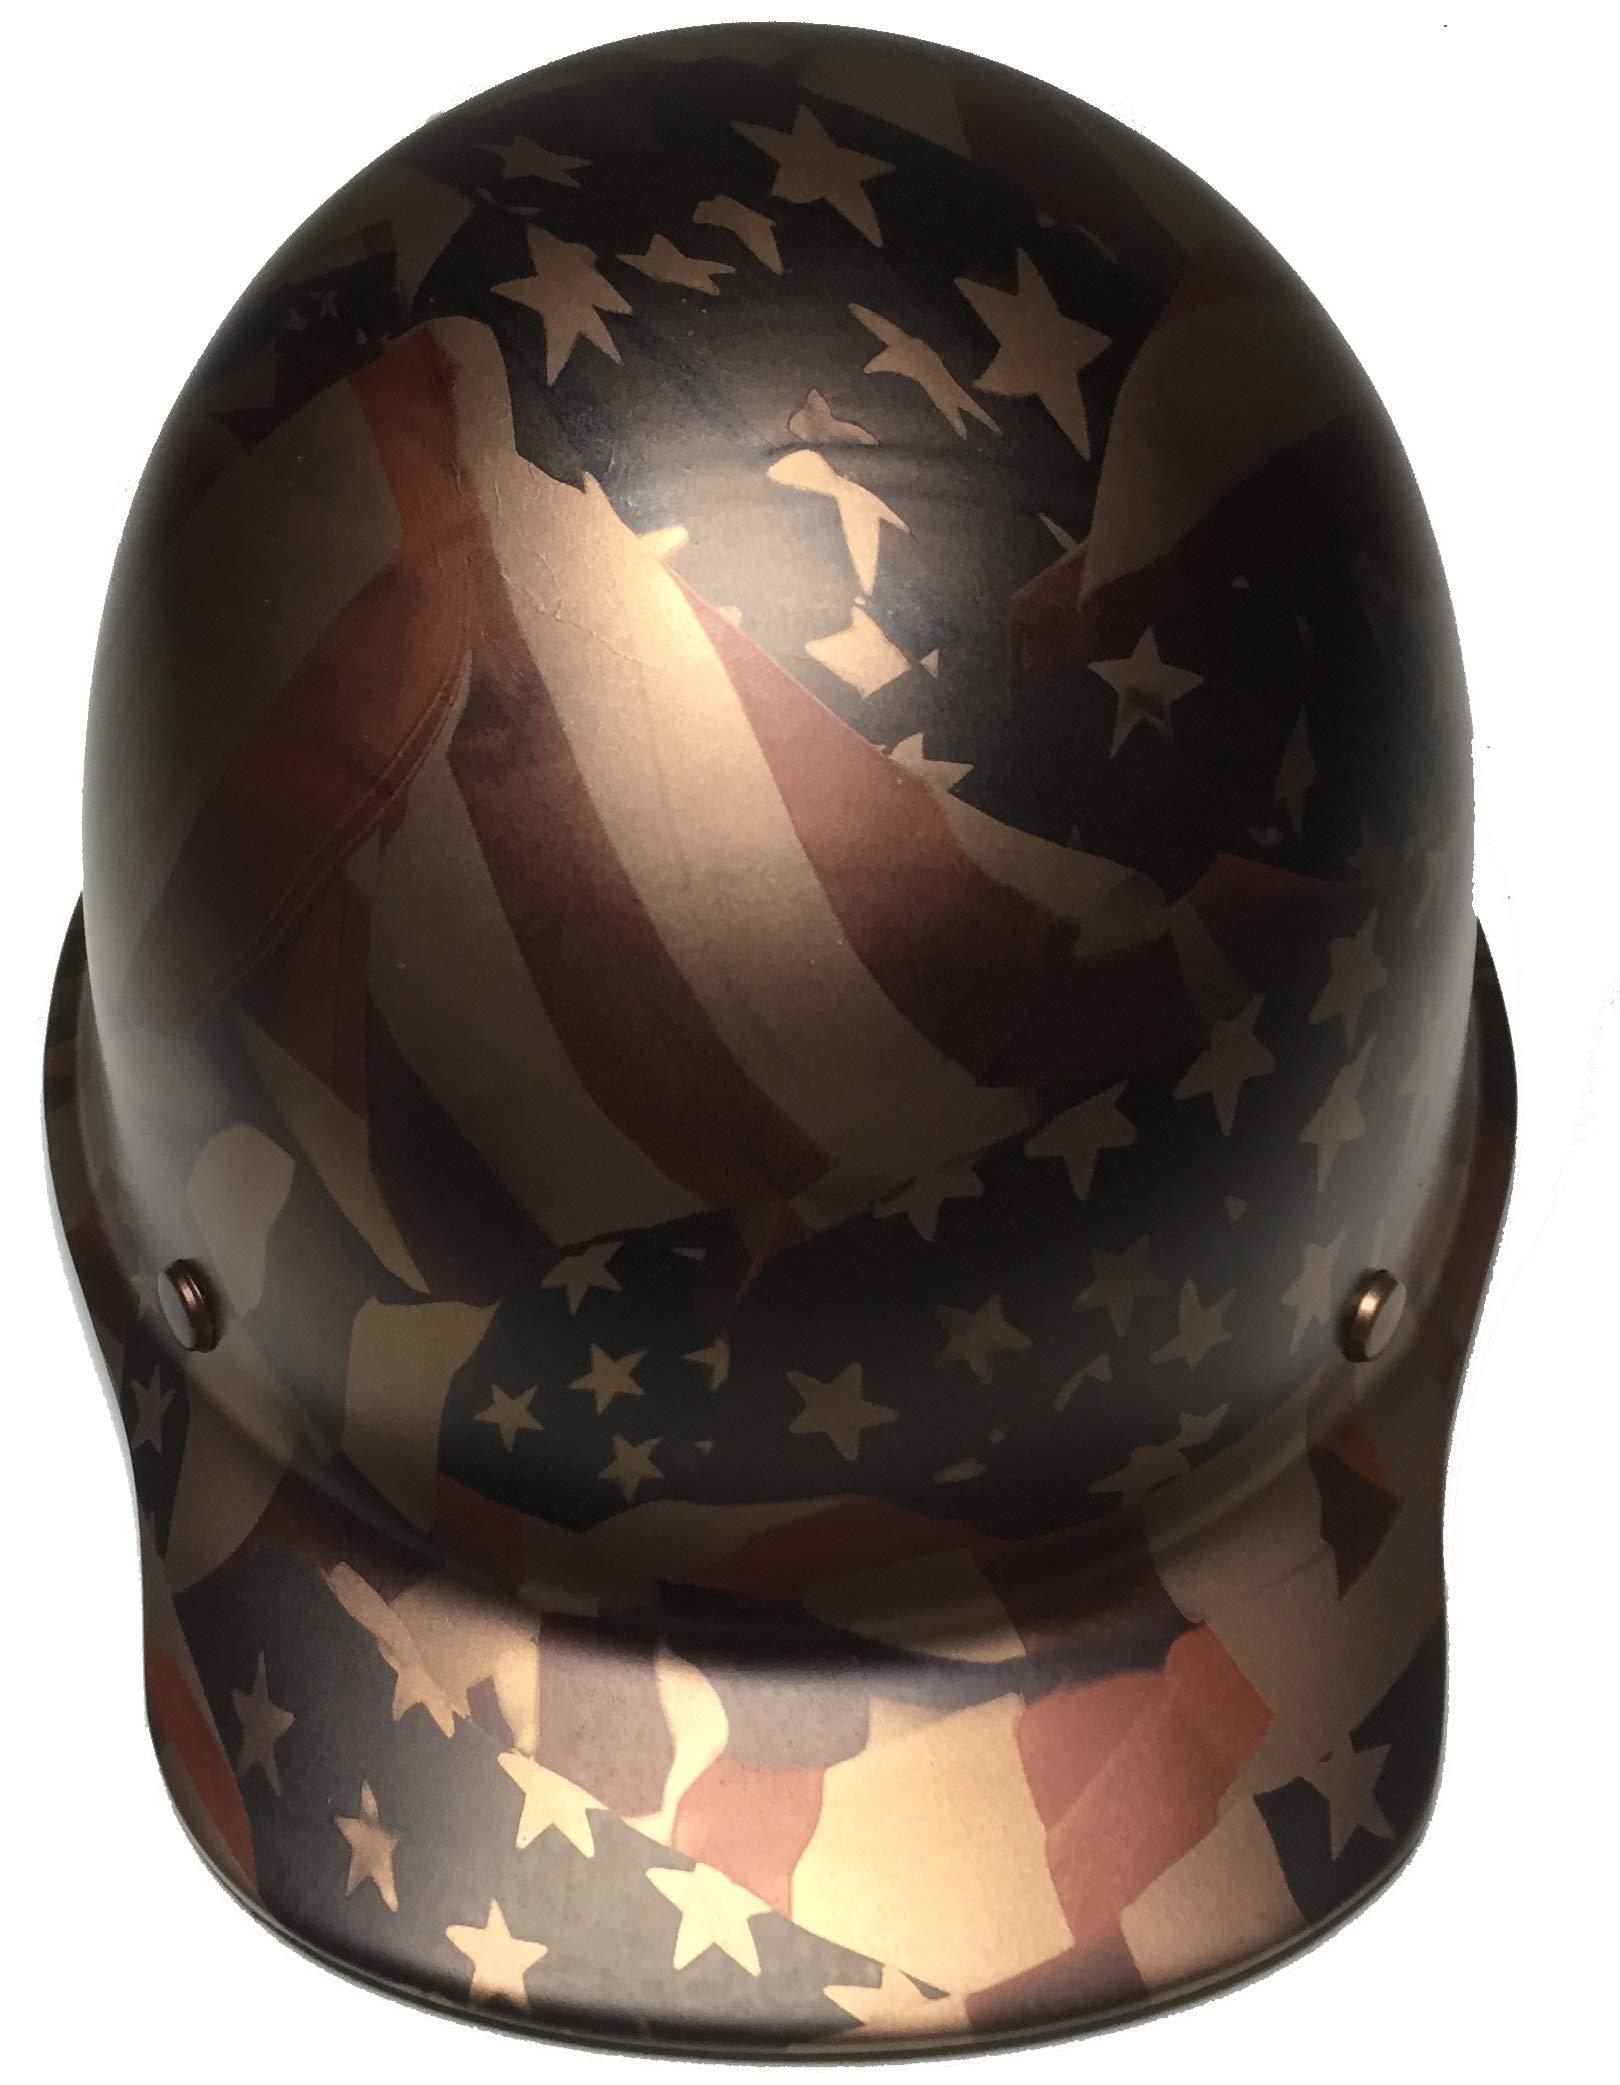 Hard Hat MSA Skullgard Cap Style Custom Copper Metallic American Flags Satin by Bag R Buck (Image #3)